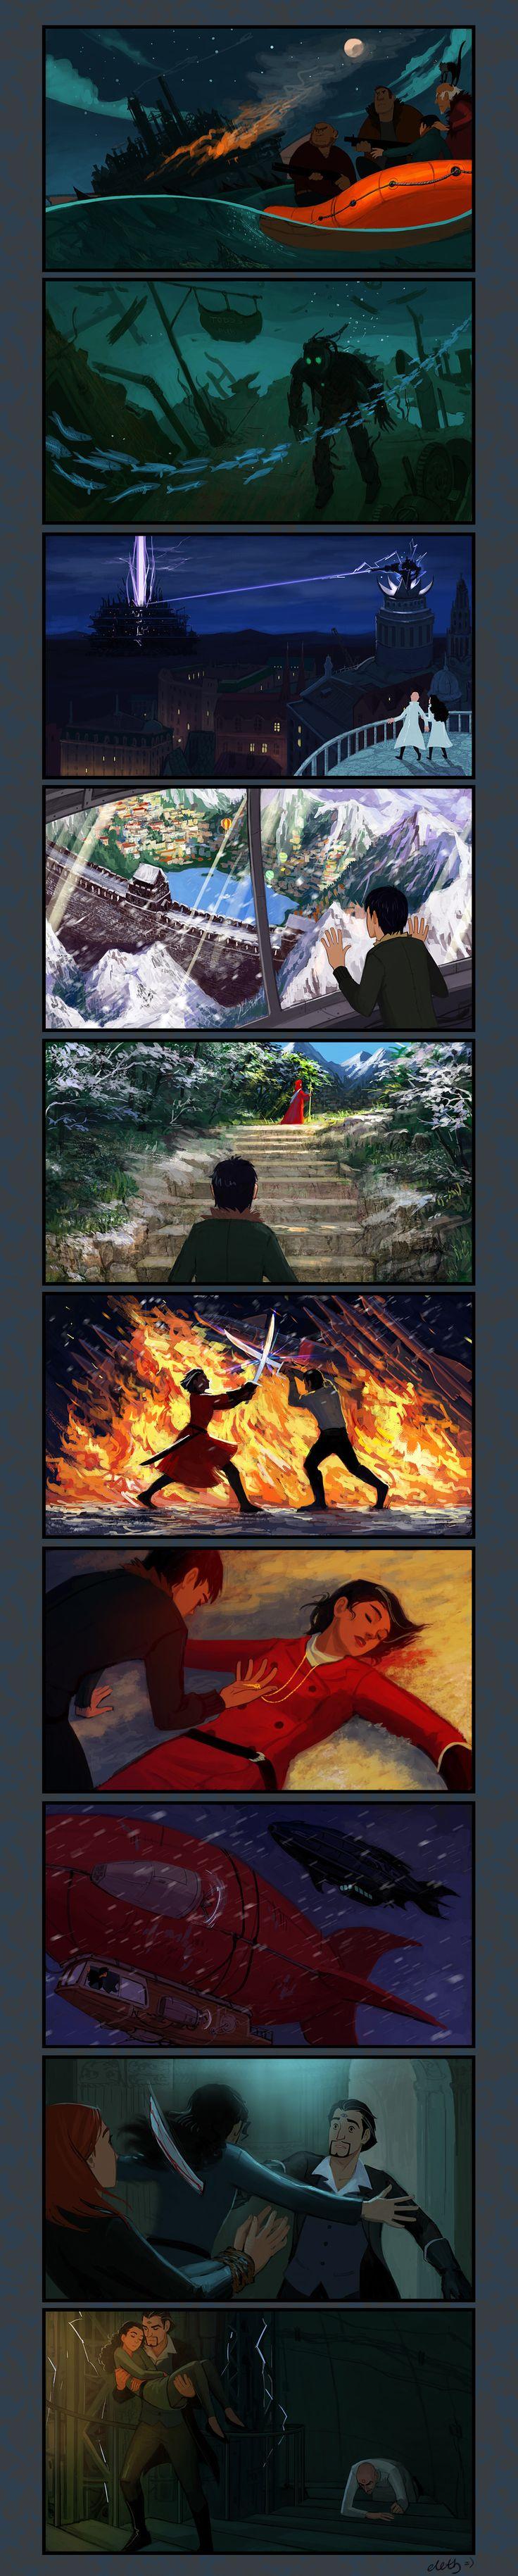 Mortal Engines explication III by eleth89